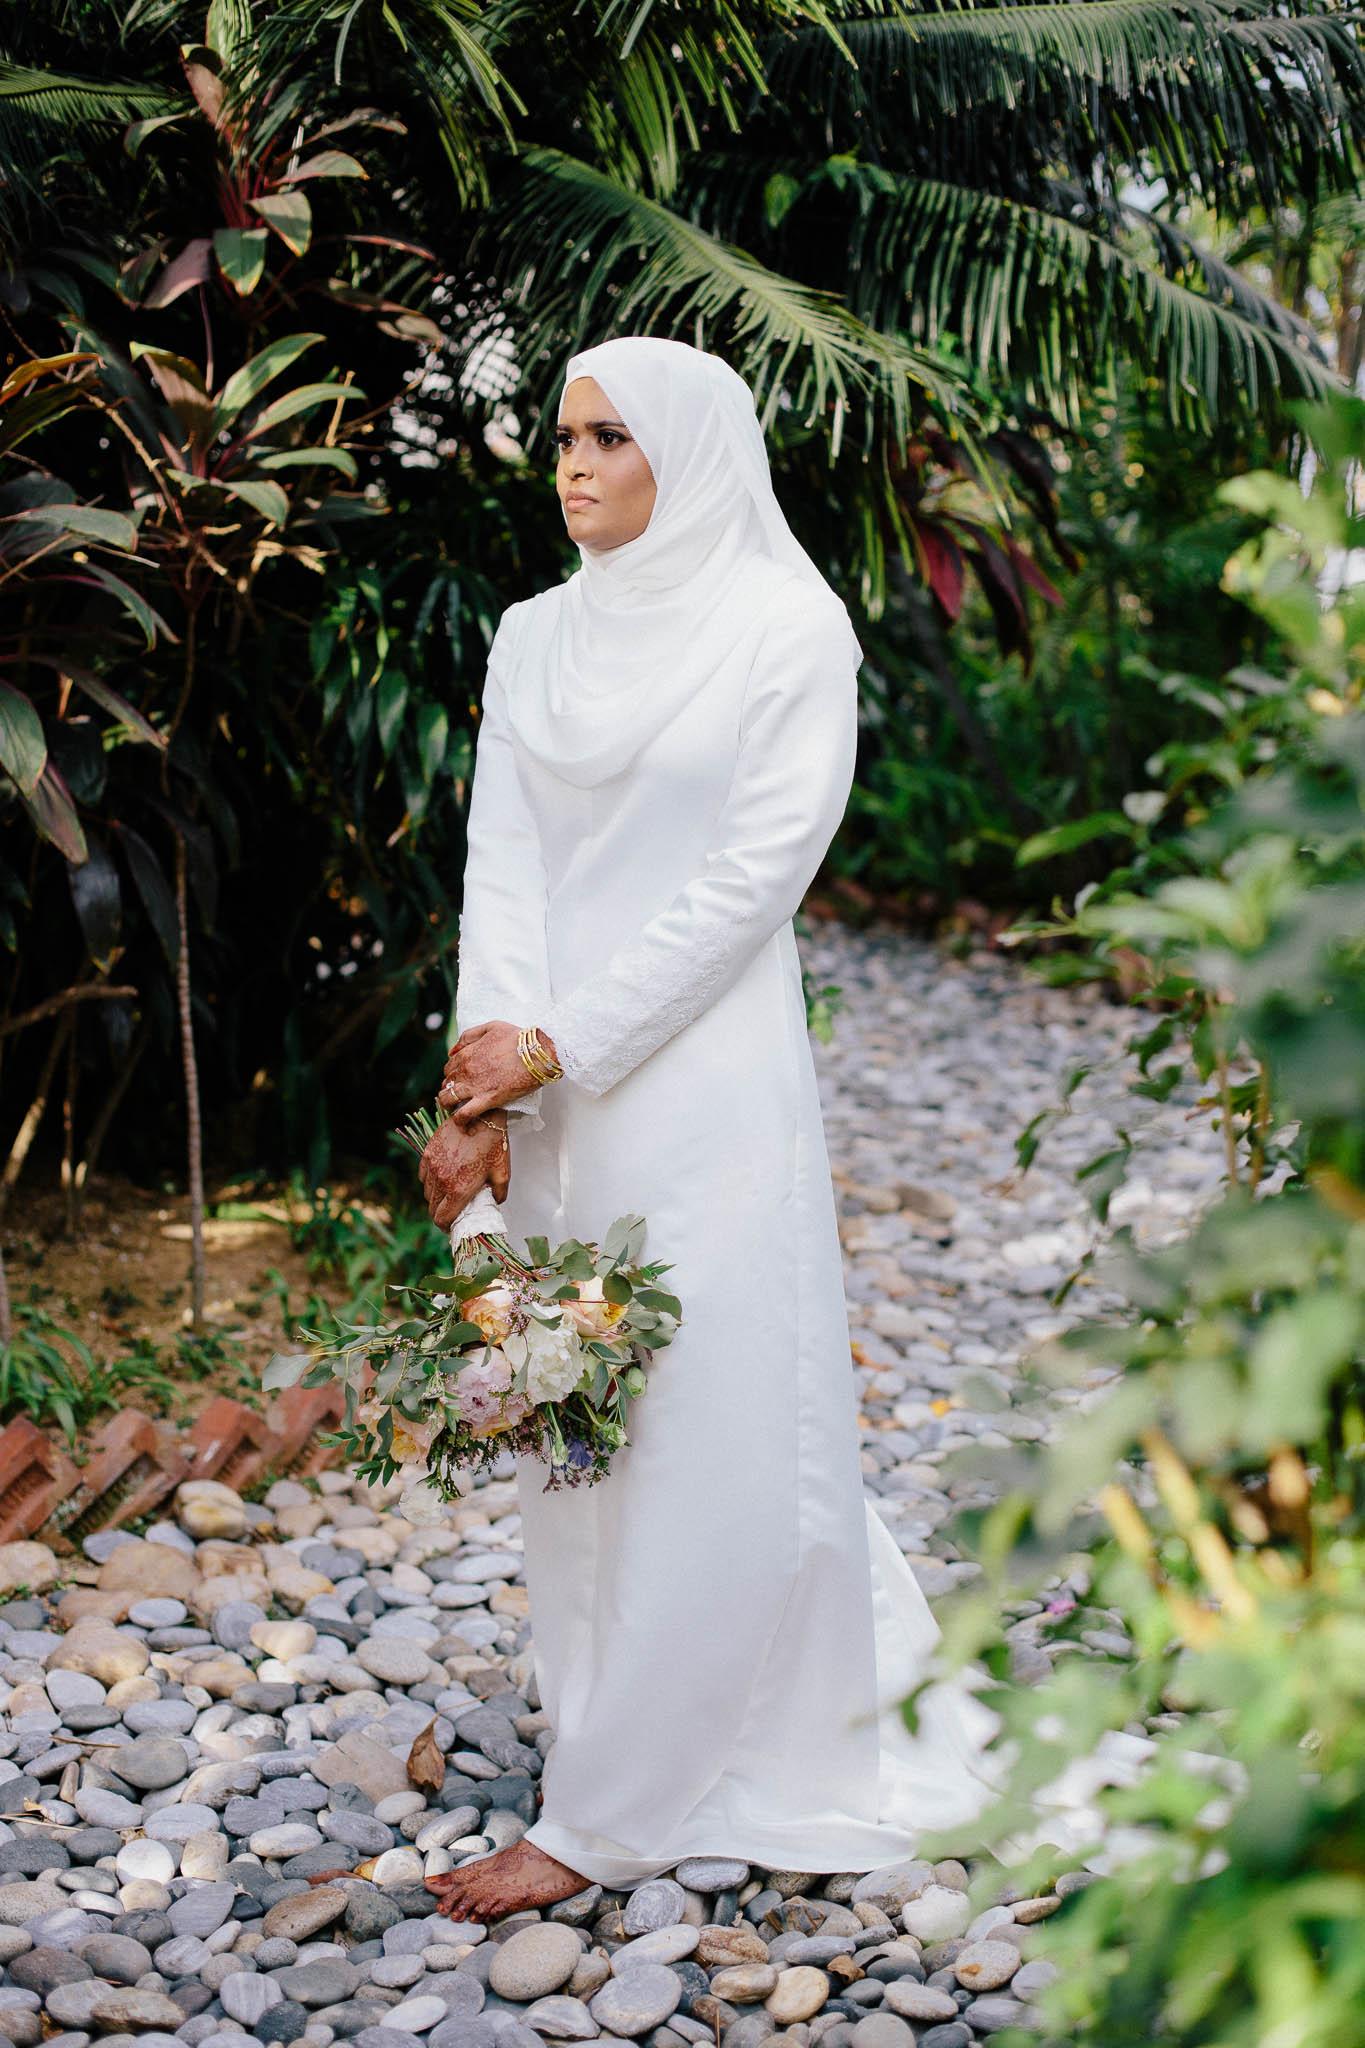 singapore-wedding-photographer-malay-indian-pre-wedding-travel-wmt-2015-shereen-farid-44.jpg